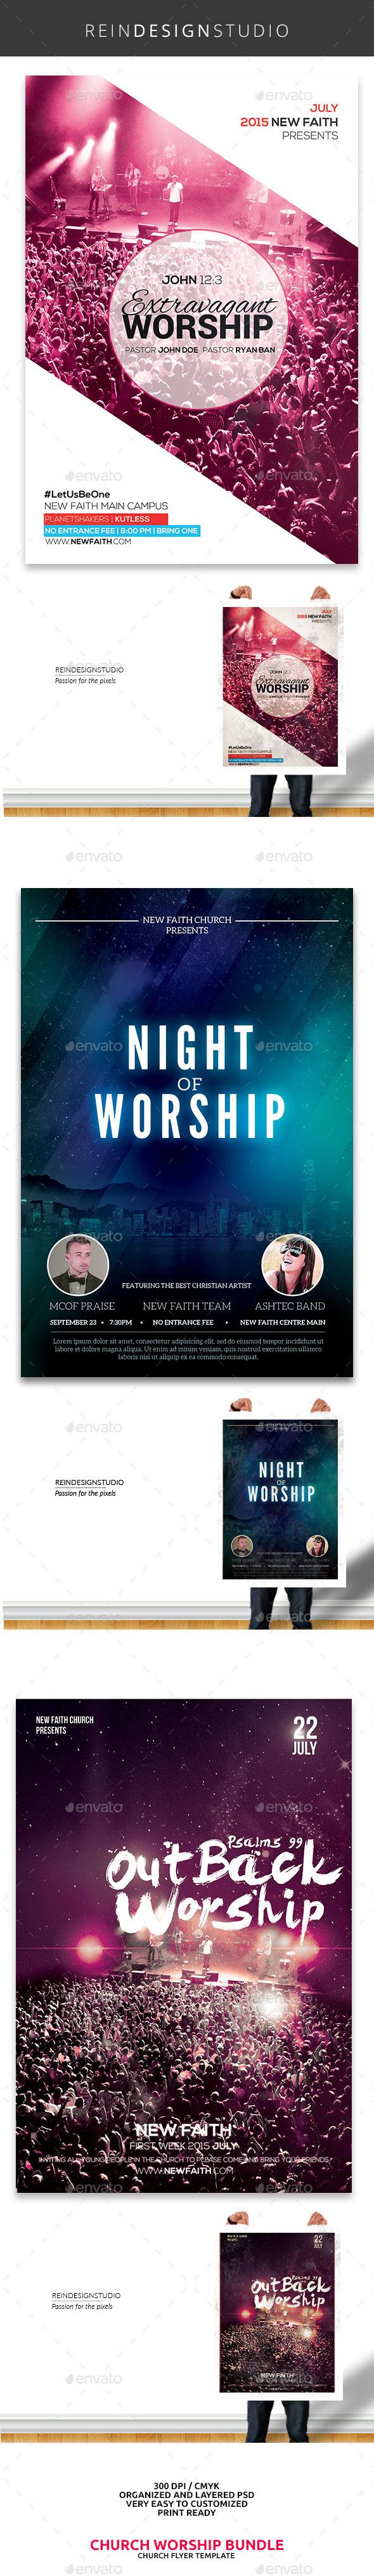 Church Worship Flyer Bundle - Church Flyers